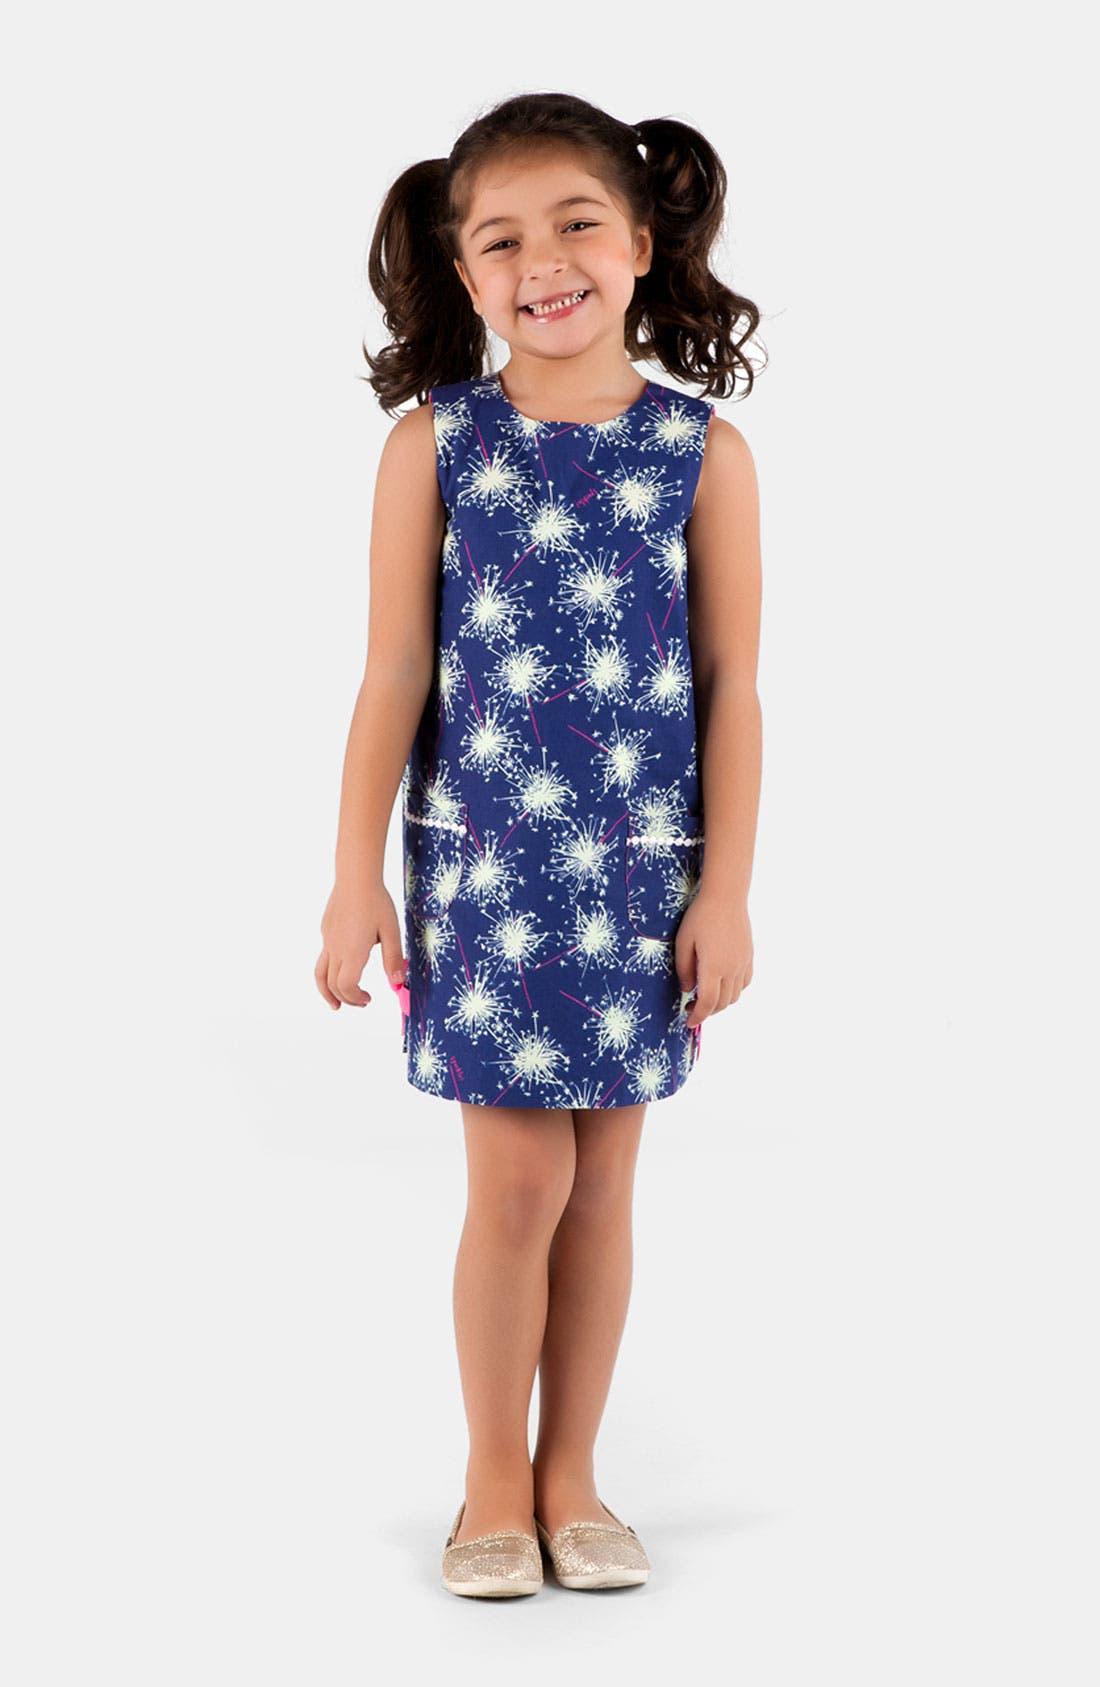 Alternate Image 1 Selected - Lilly Pulitzer® Shift Dress (Little Girls & Big Girls)